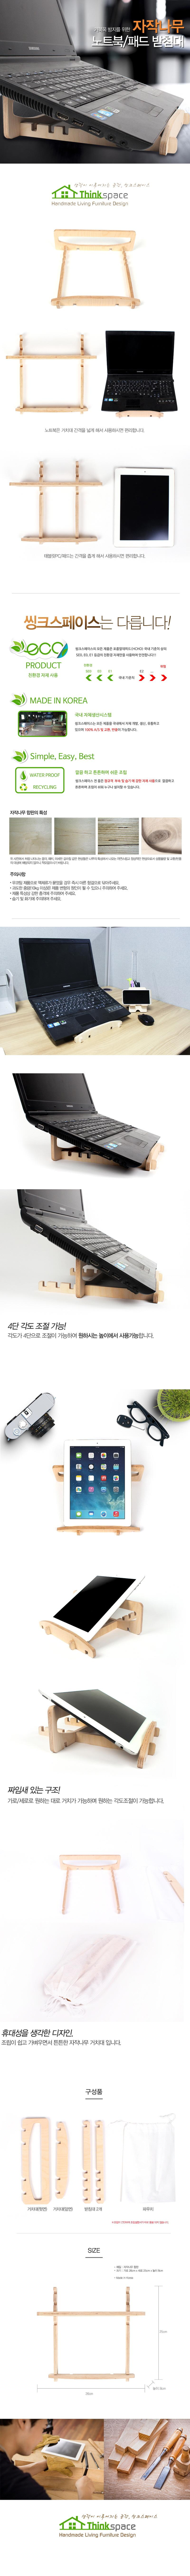 wood_notebookbase_005.jpg